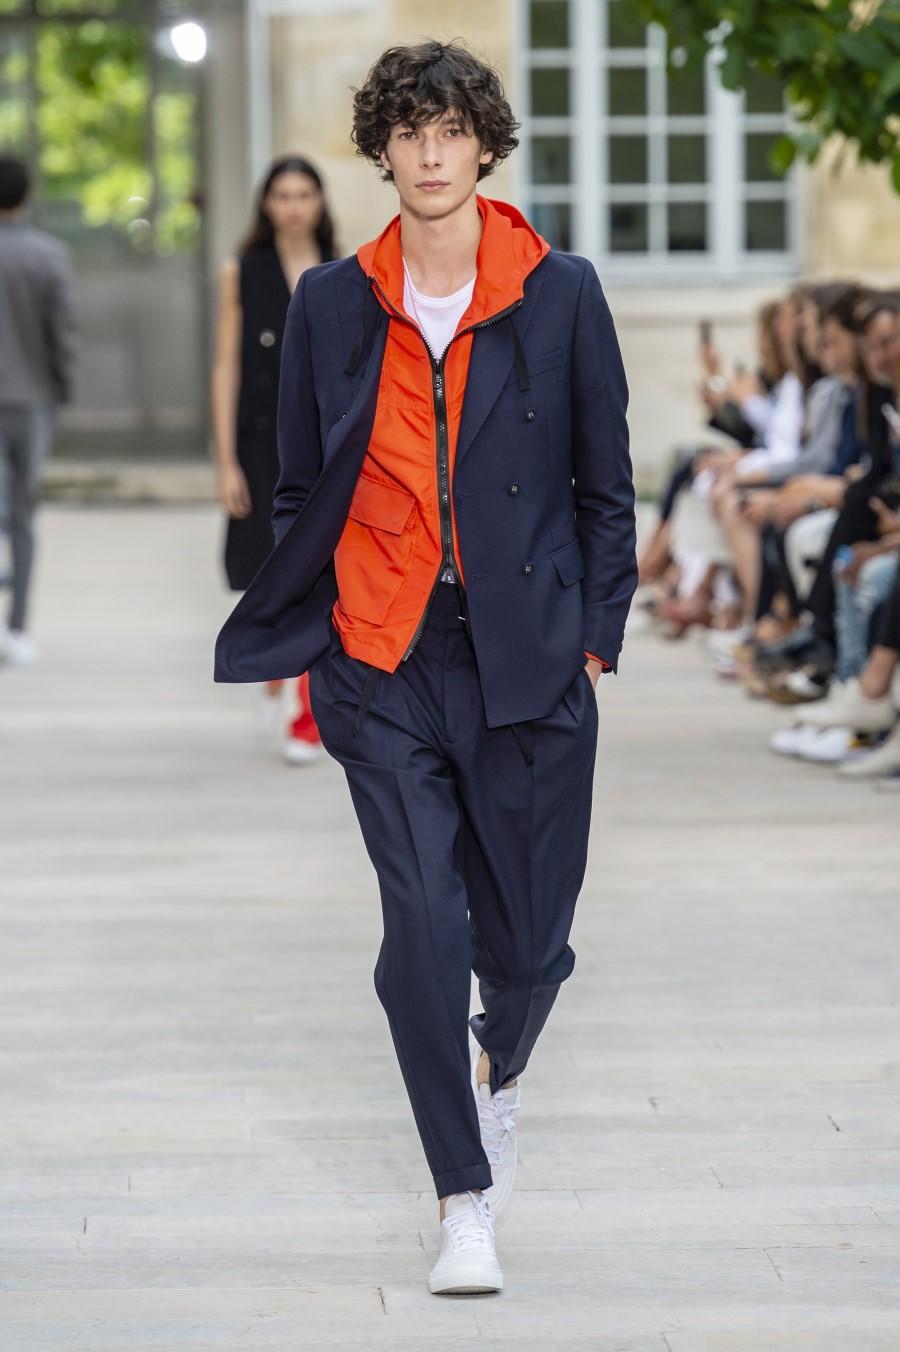 Officine Générale Spring/Summer 2019 - Paris Fashion Week